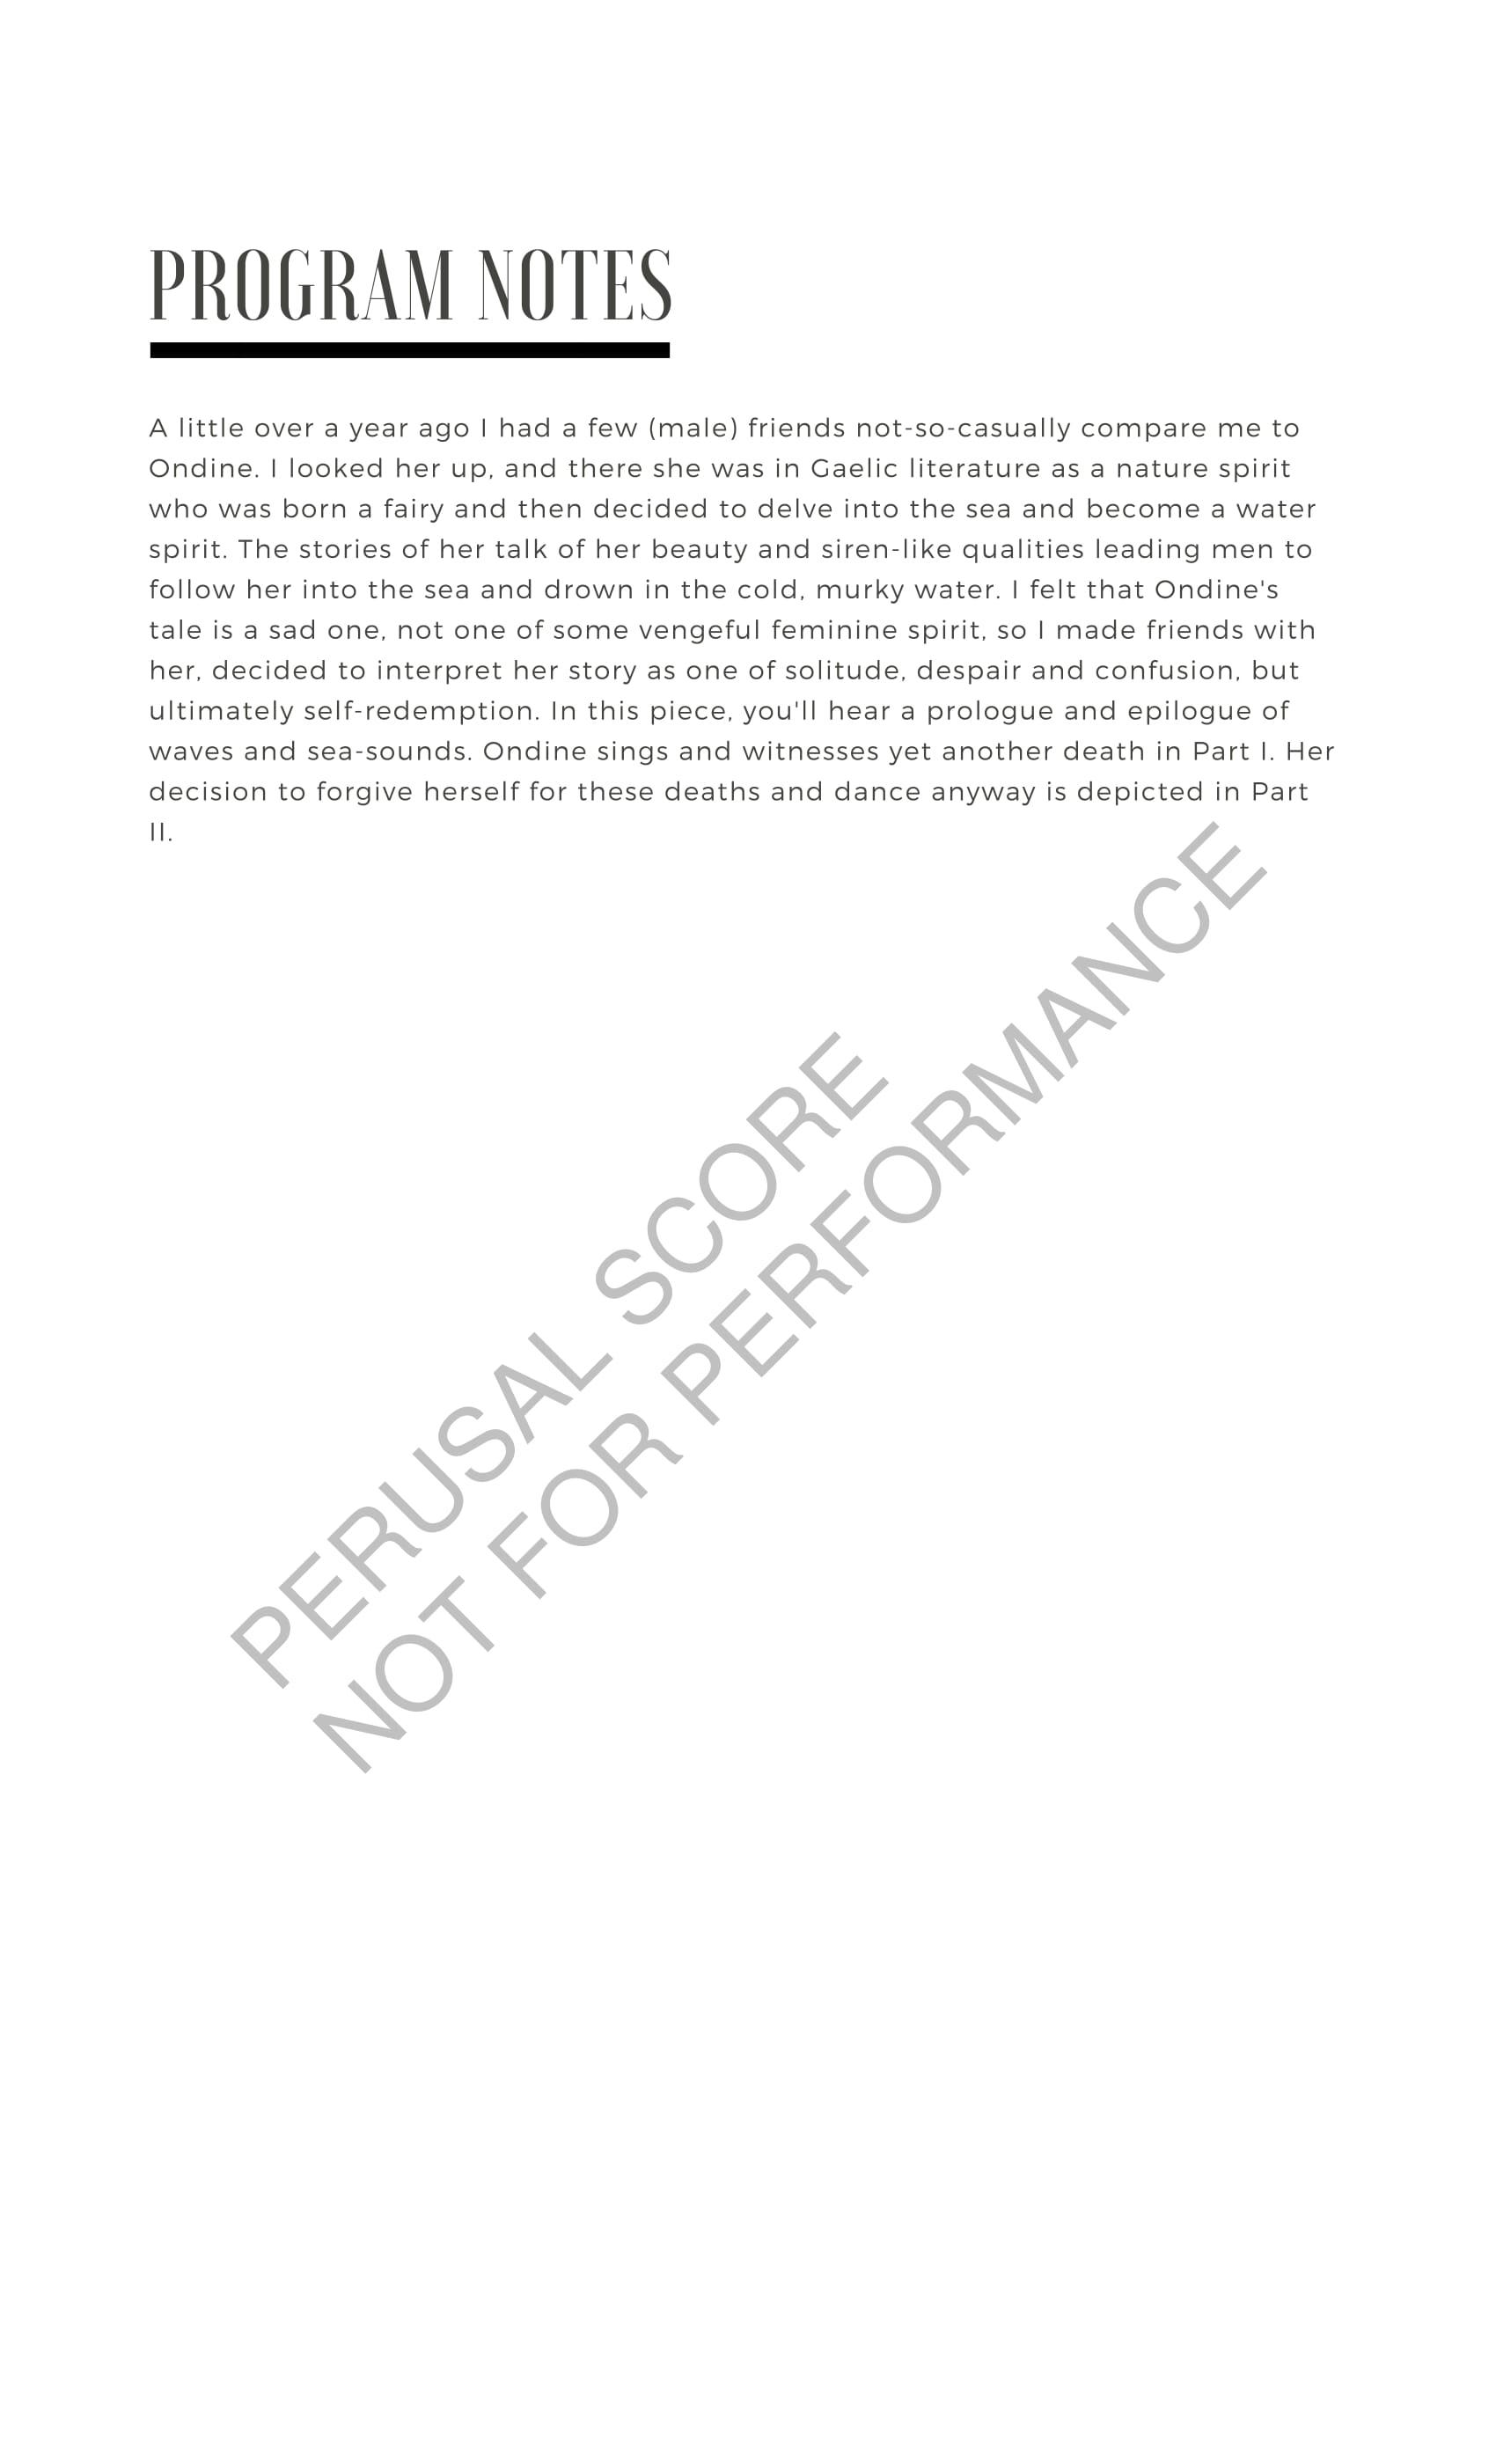 Boyd Ondine Score-watermark (3)-04.jpg